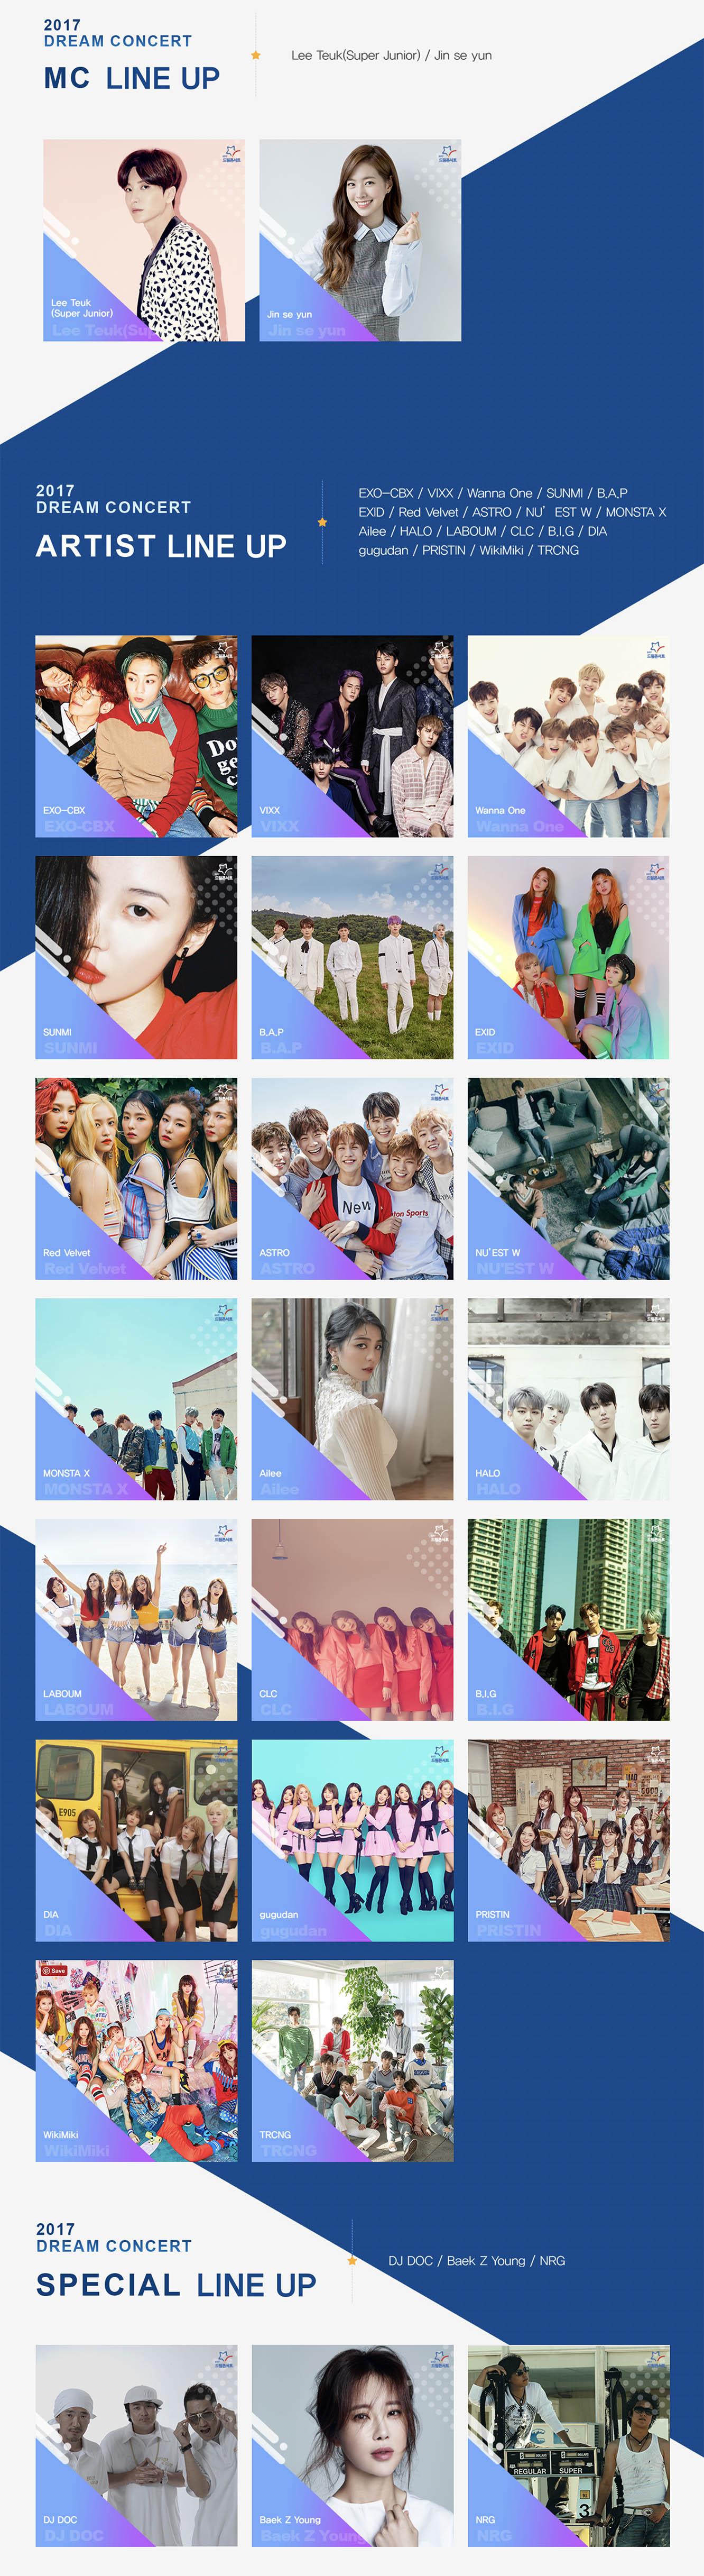 Dream-Concert-2017-Lineup